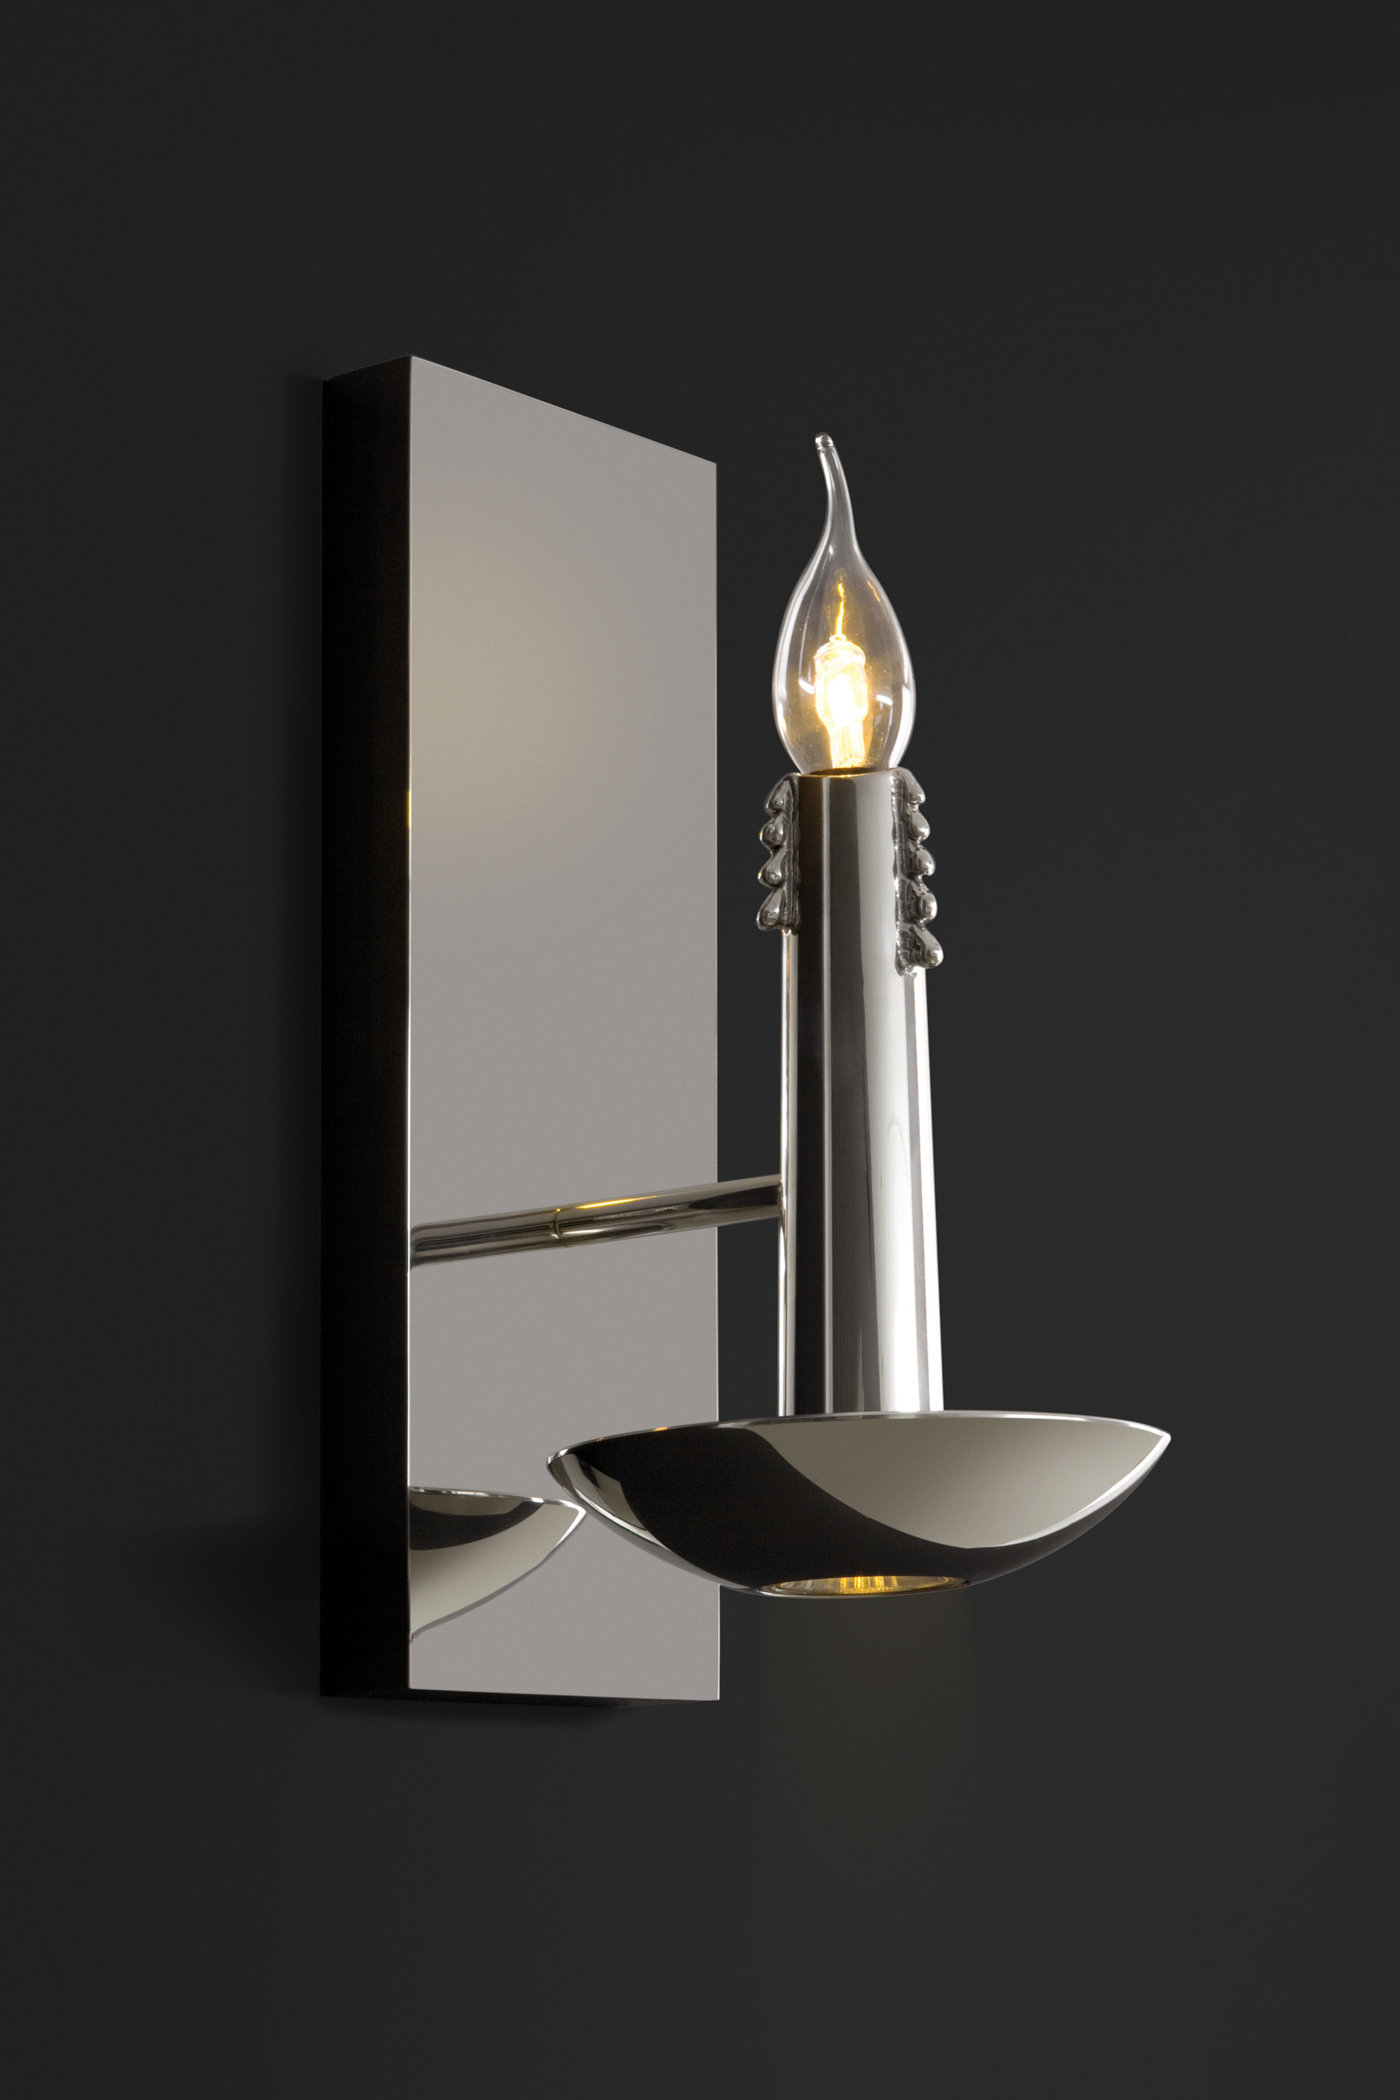 Lighting by Brand van Egmond, The Netherlands